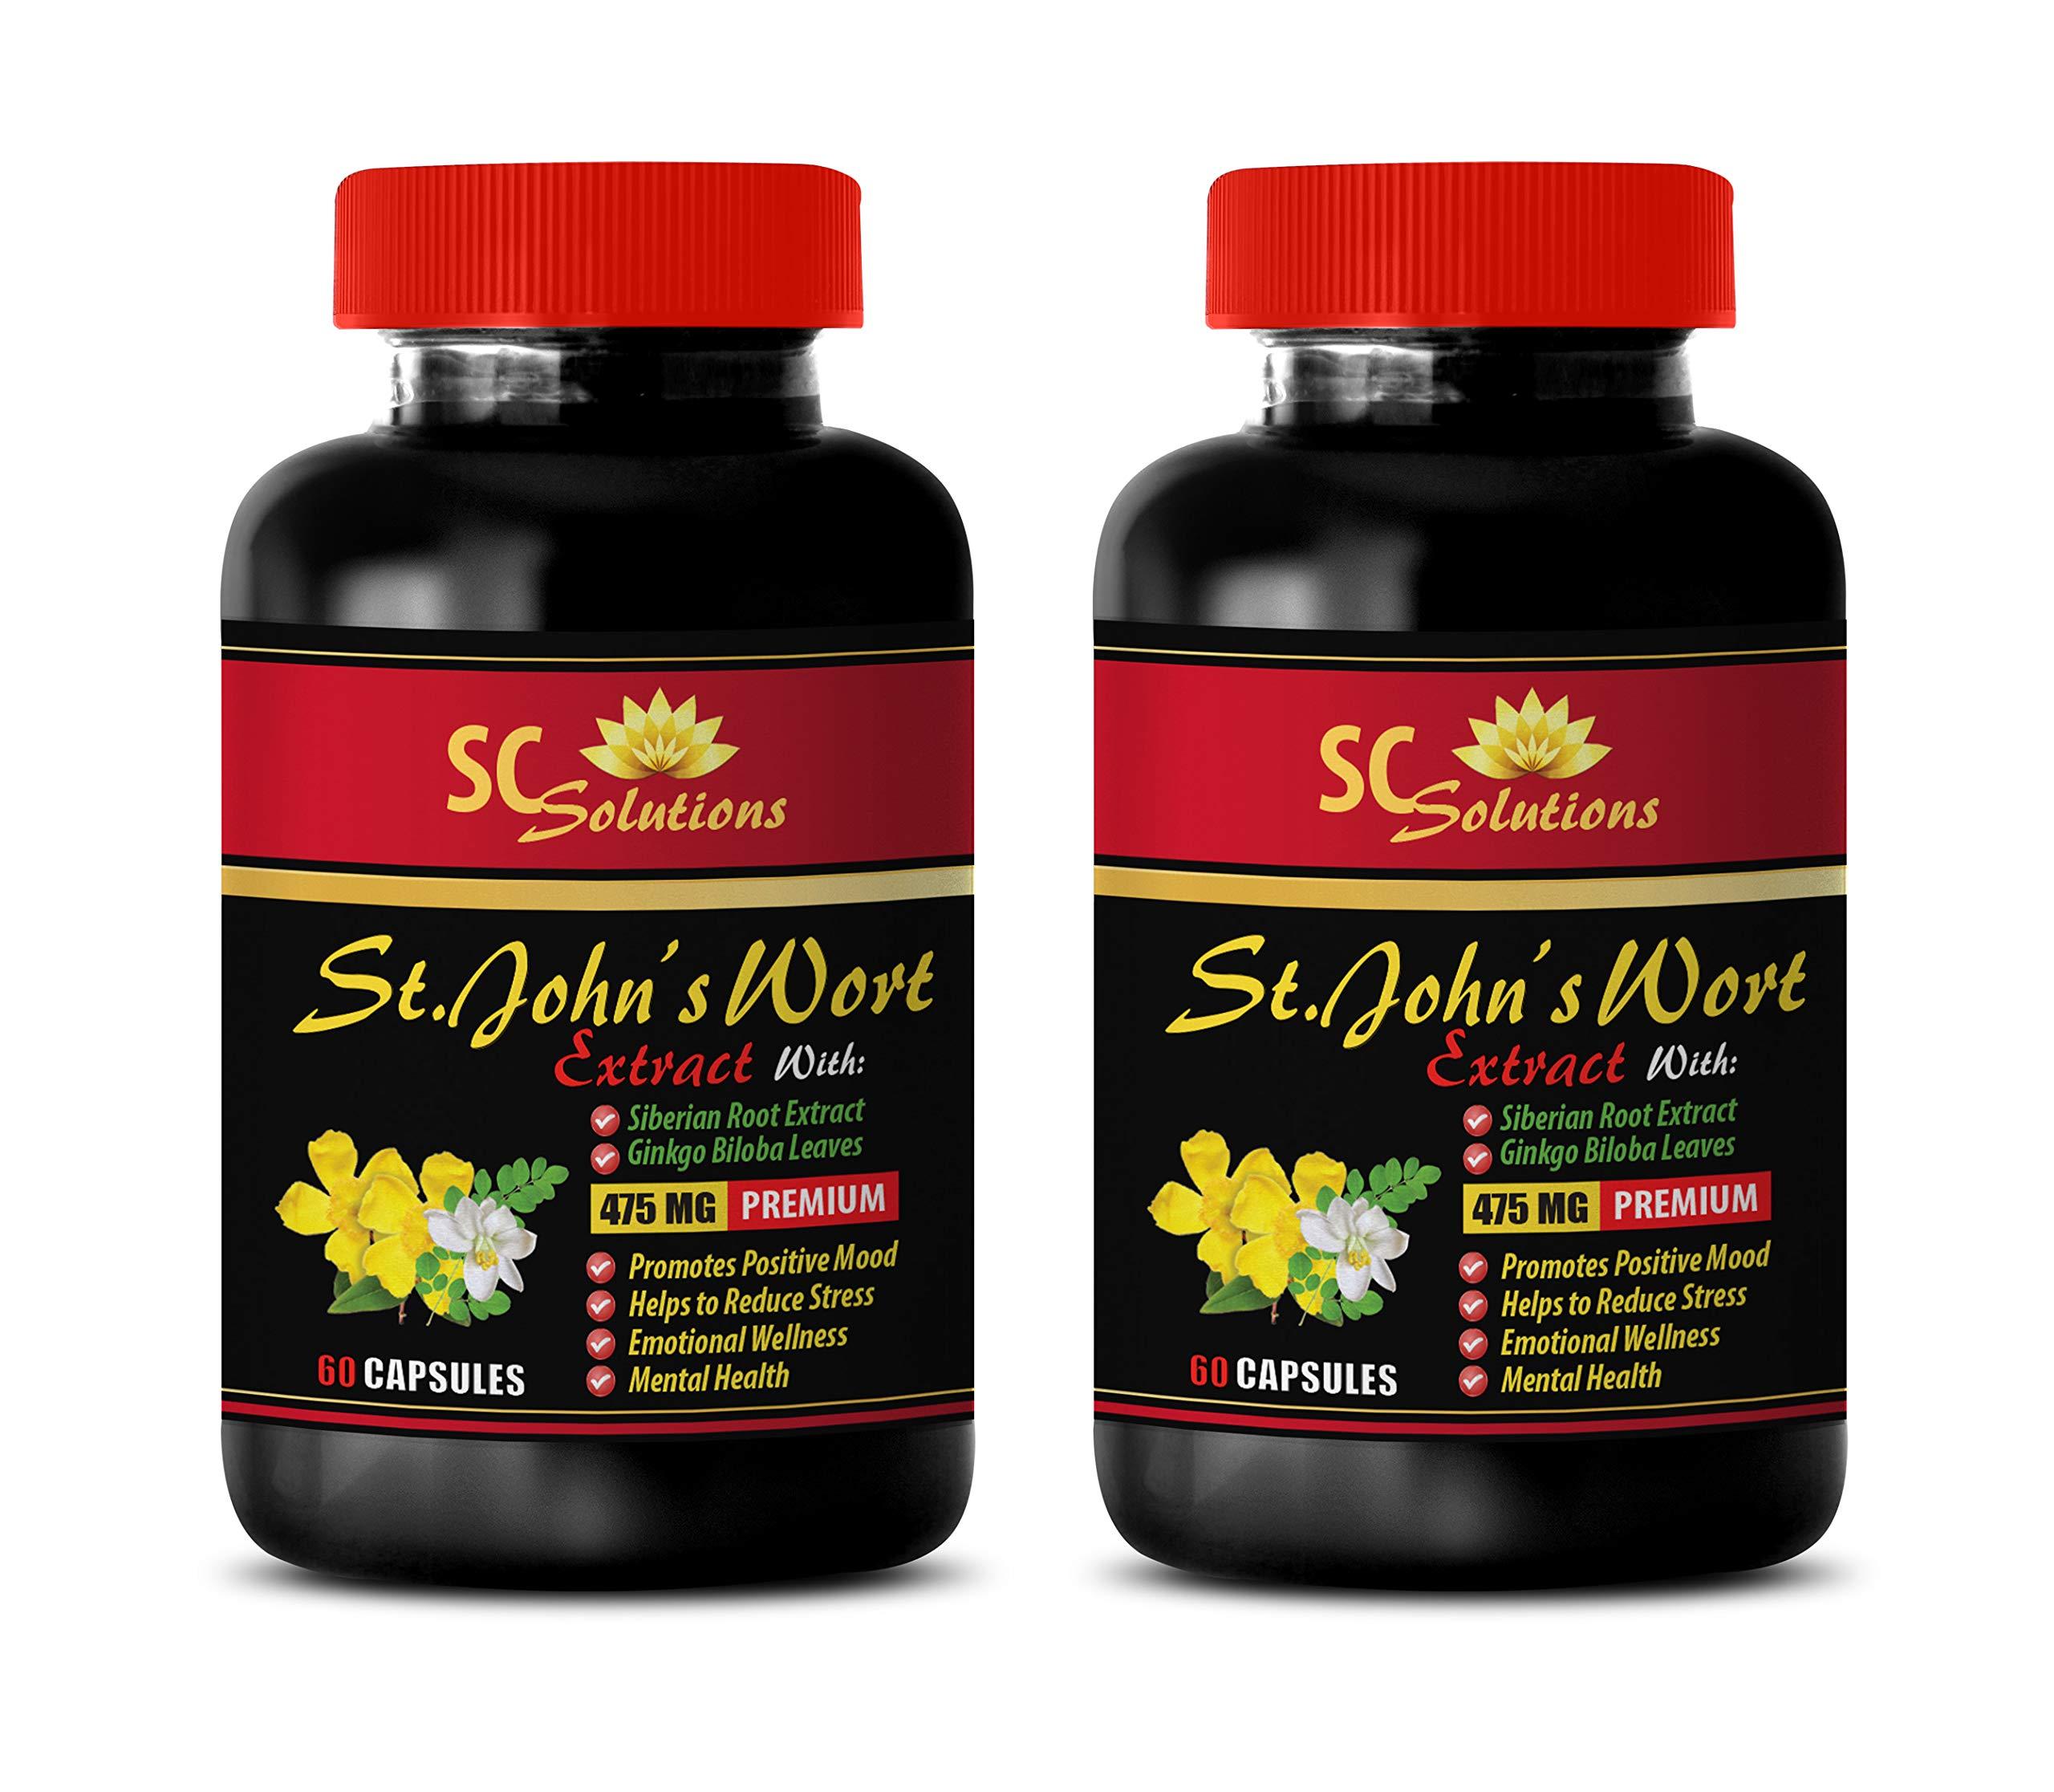 Depression Supplements Natural - ST. John's Wort Extract - St Johns Wort Bulk Supplements - 2 Bottles 120 Capsules